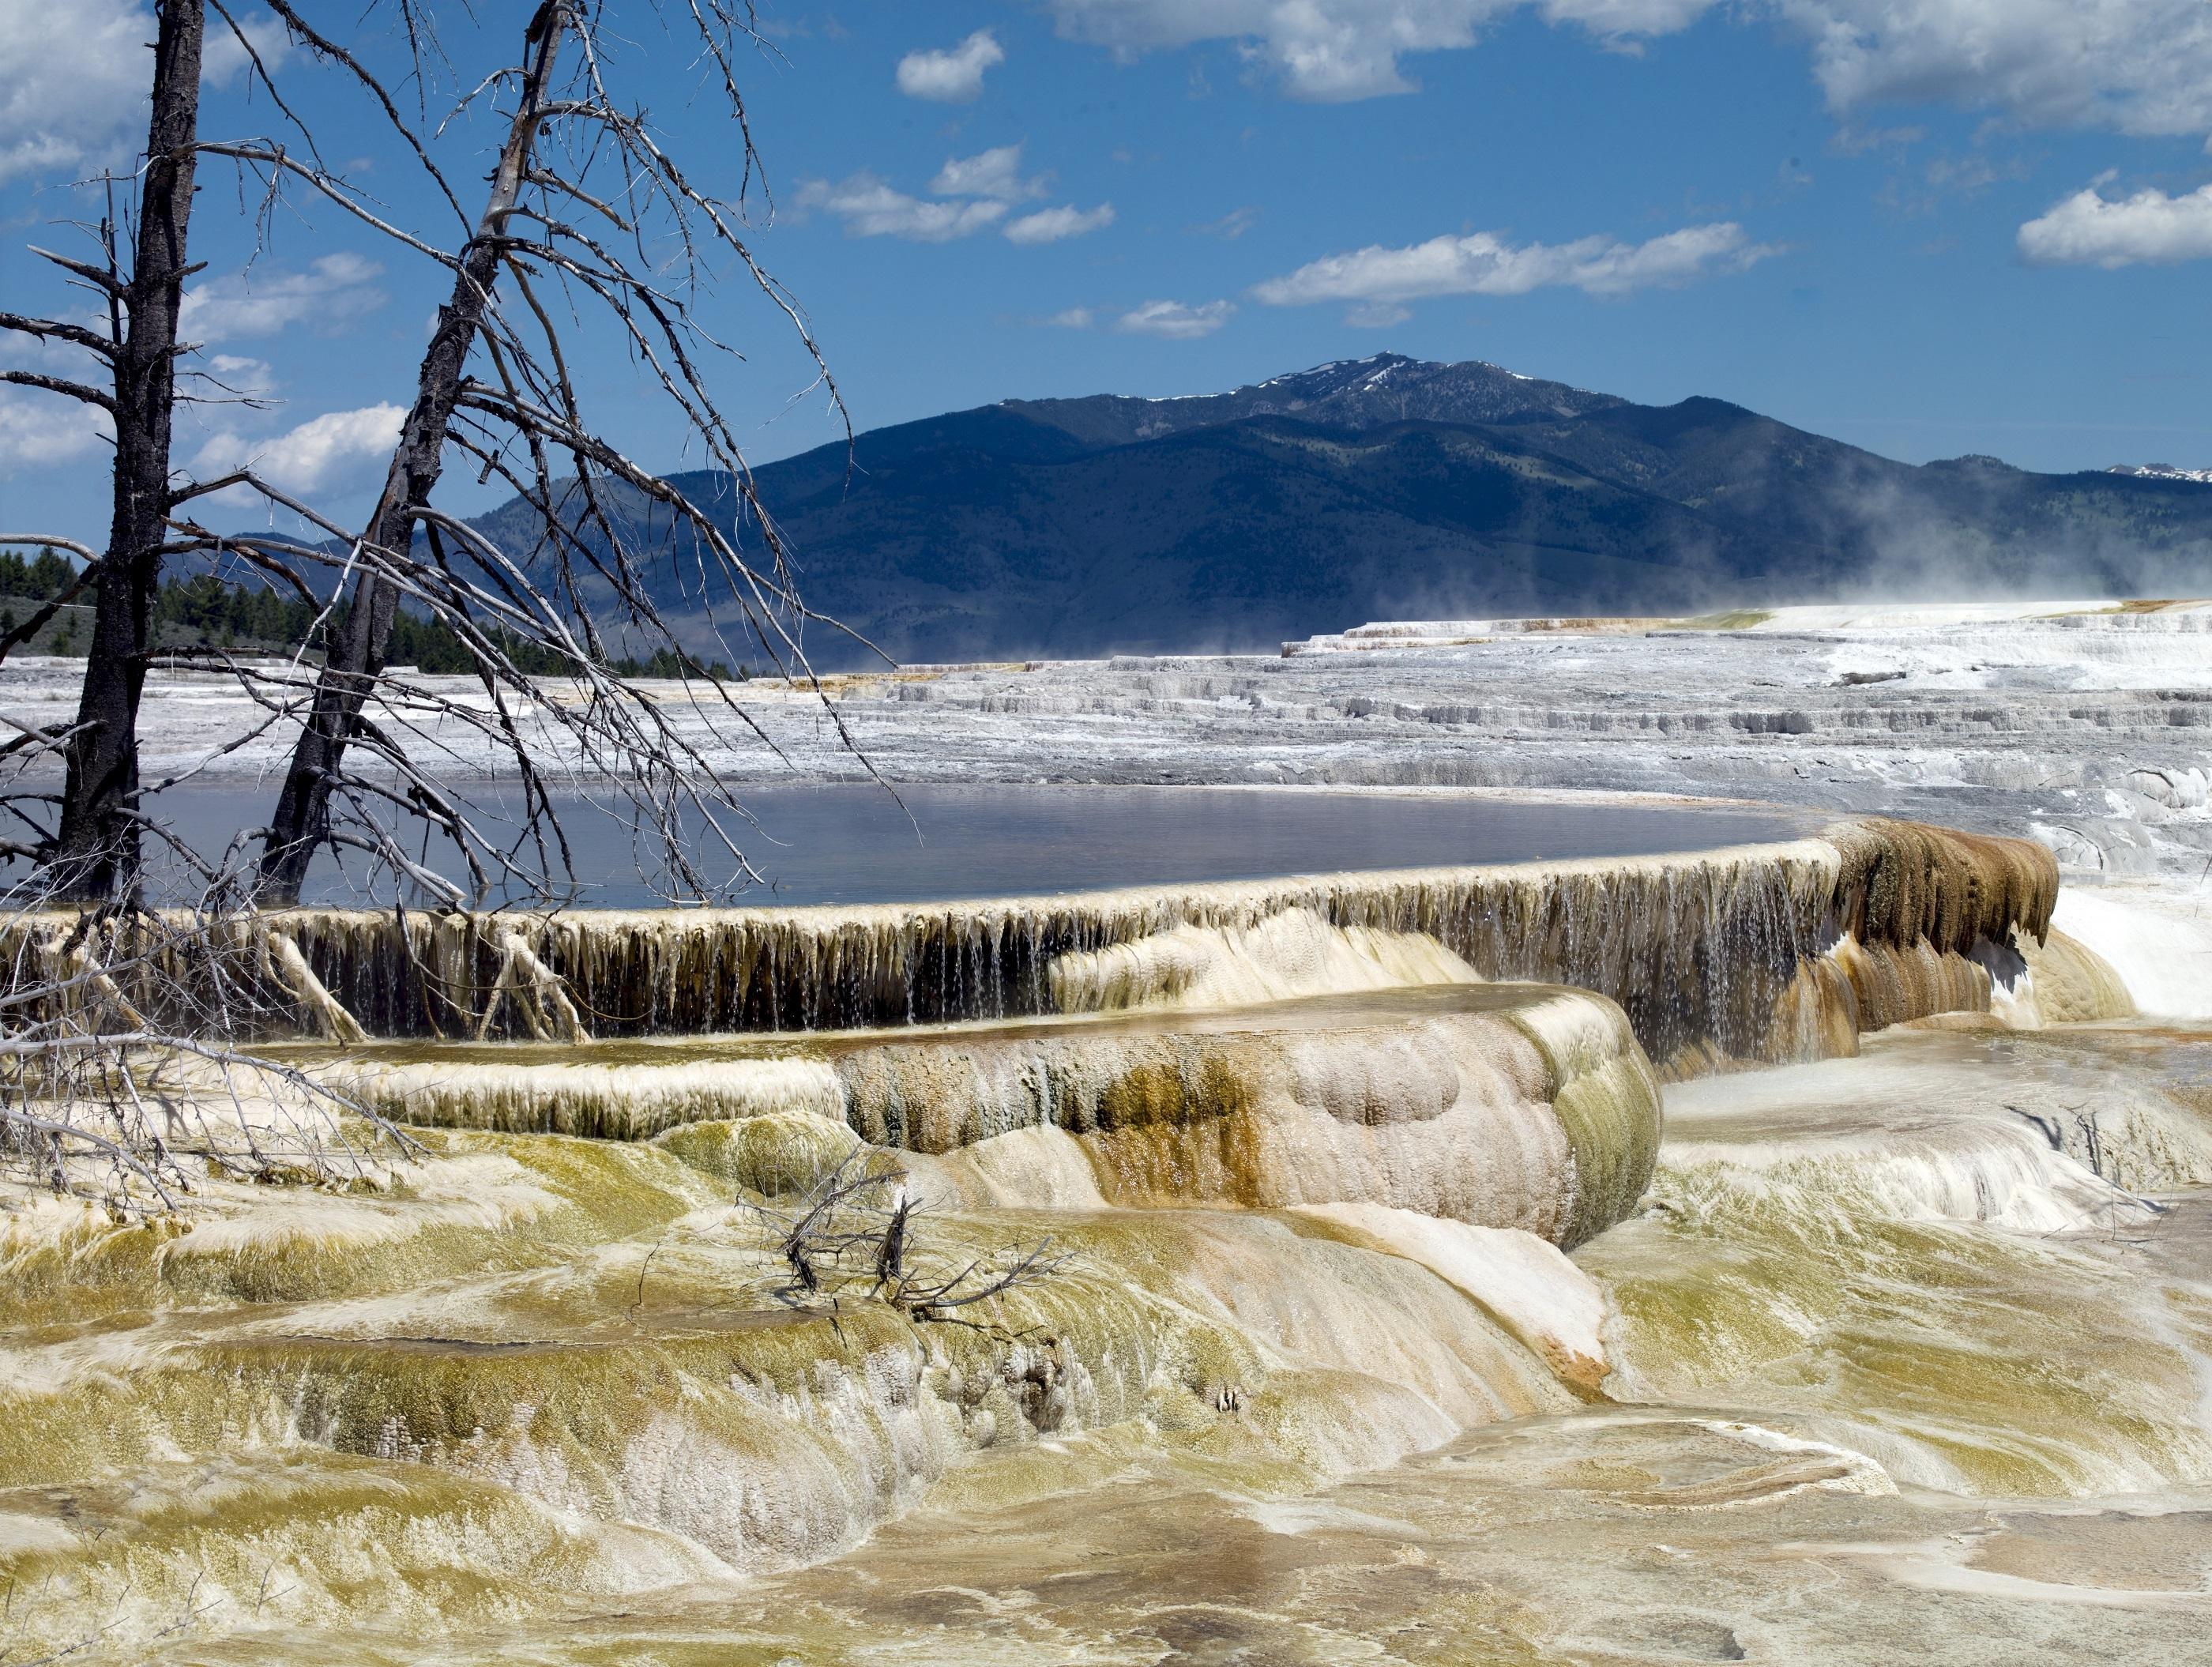 mammoth-hot-springs-1238259